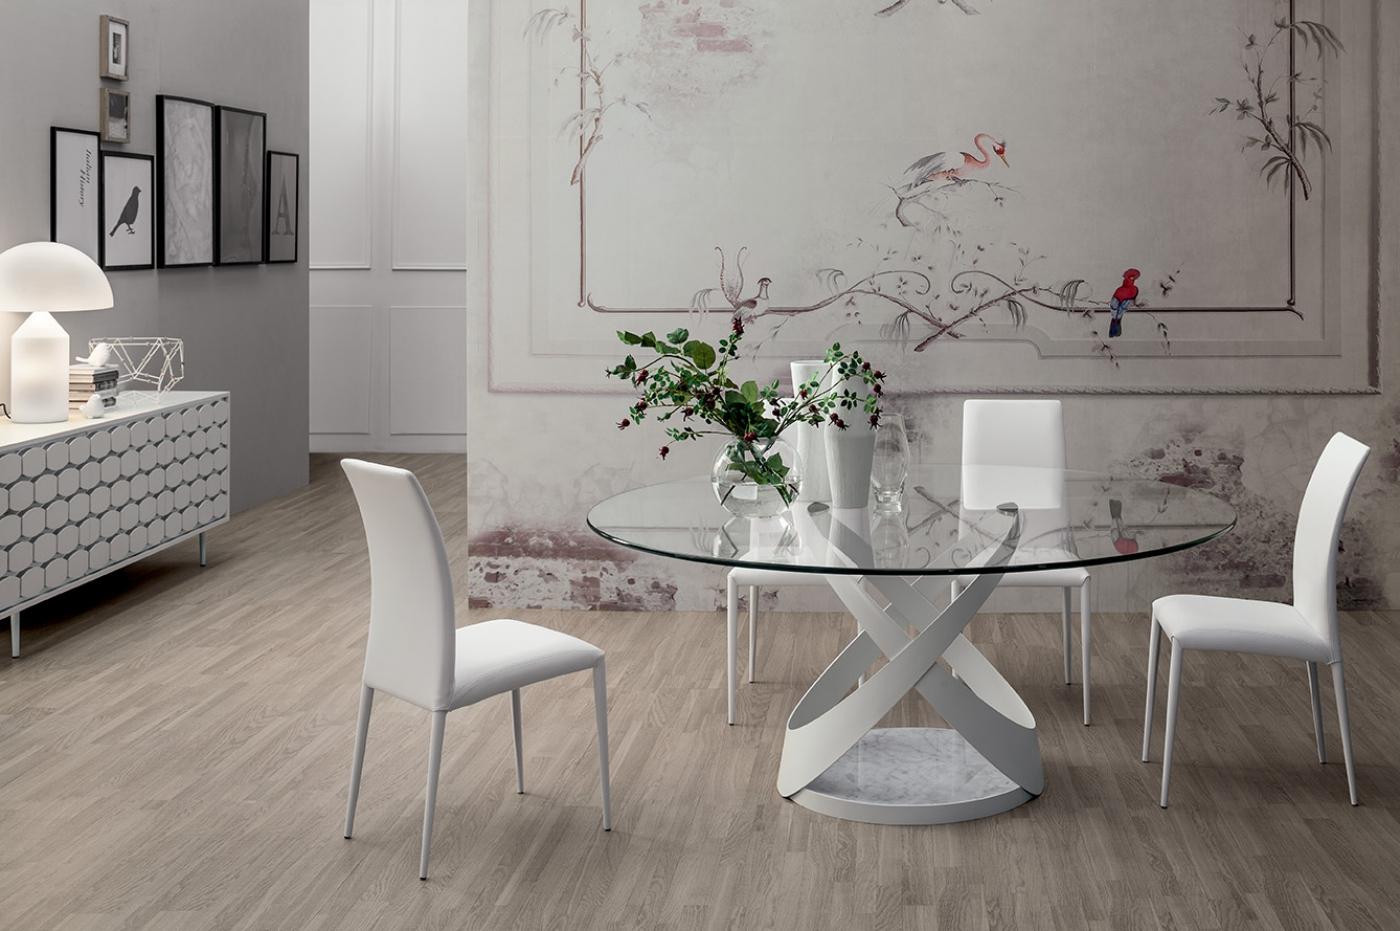 Capri tonin casa tables for Arredo casa firenze